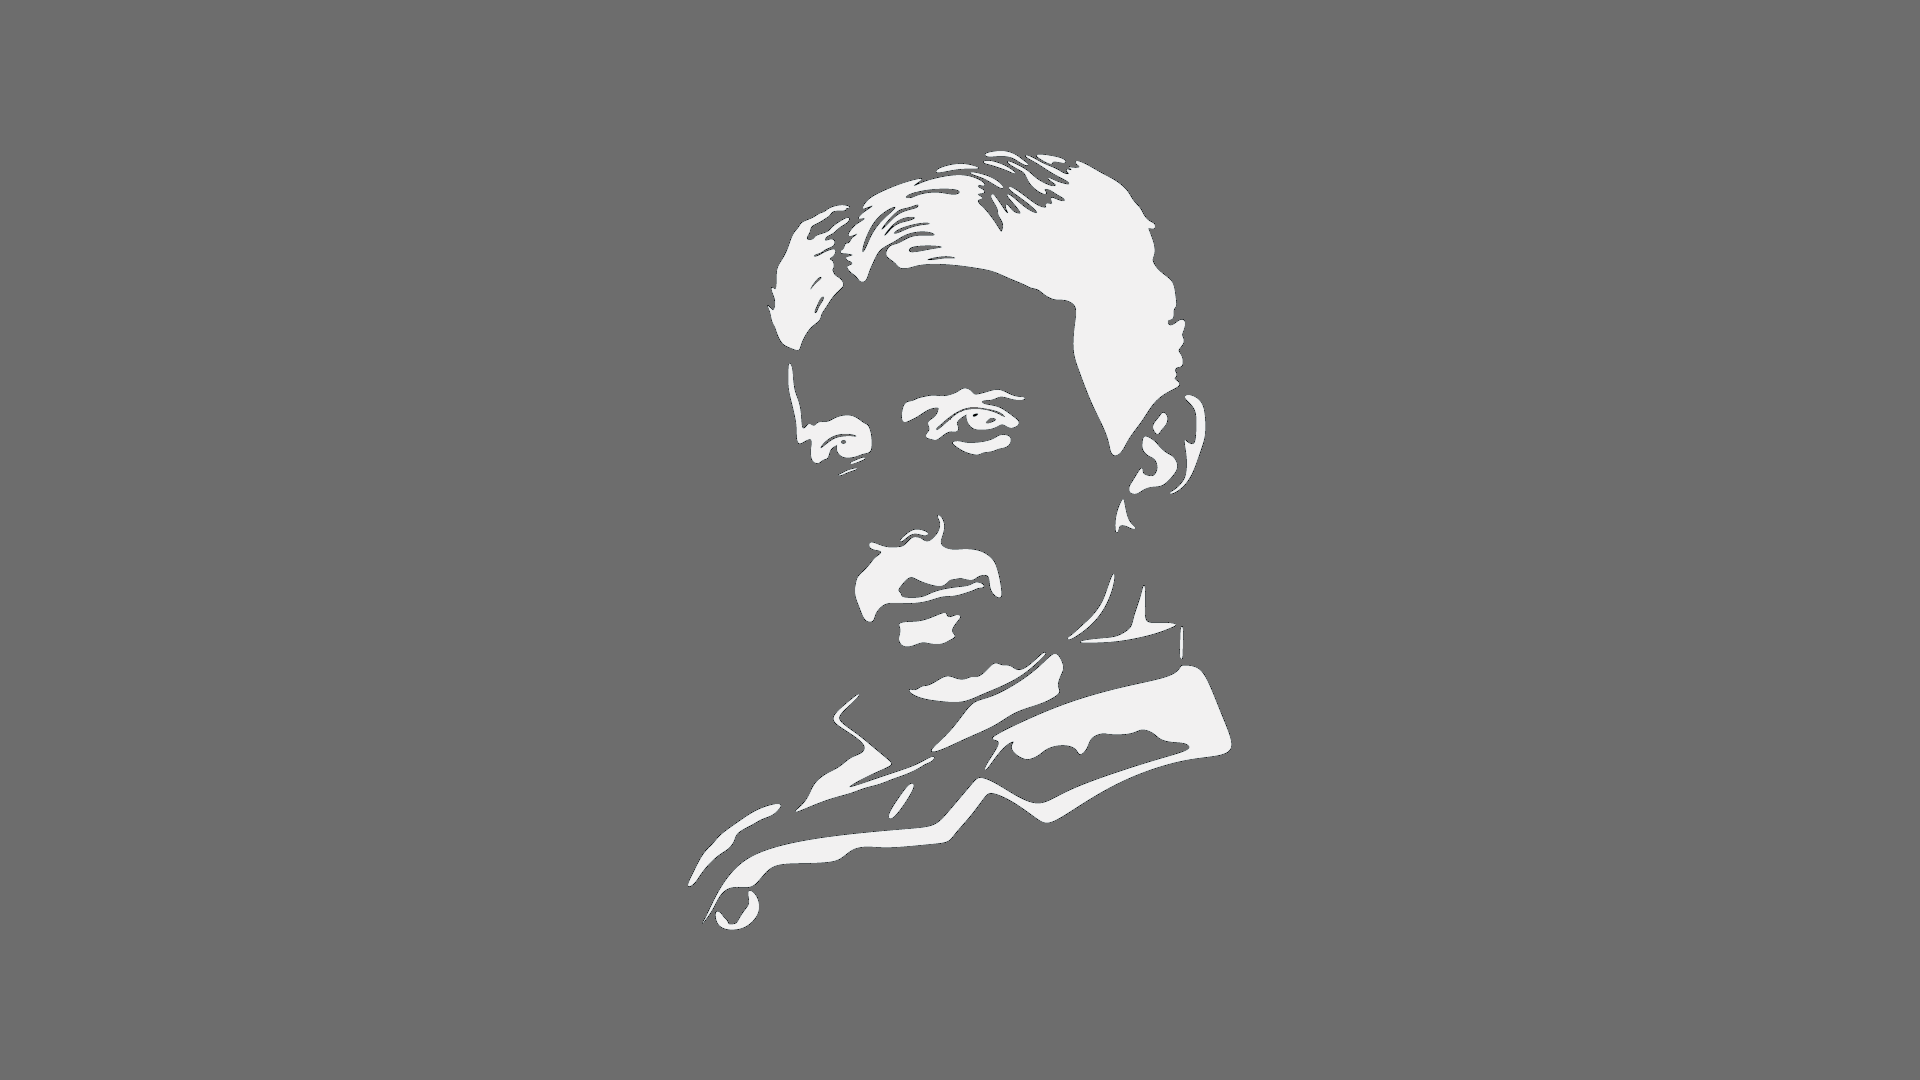 Pin By Natasa Pecanac On Brain Health Nikola Tesla Tesla Hd Wallpaper